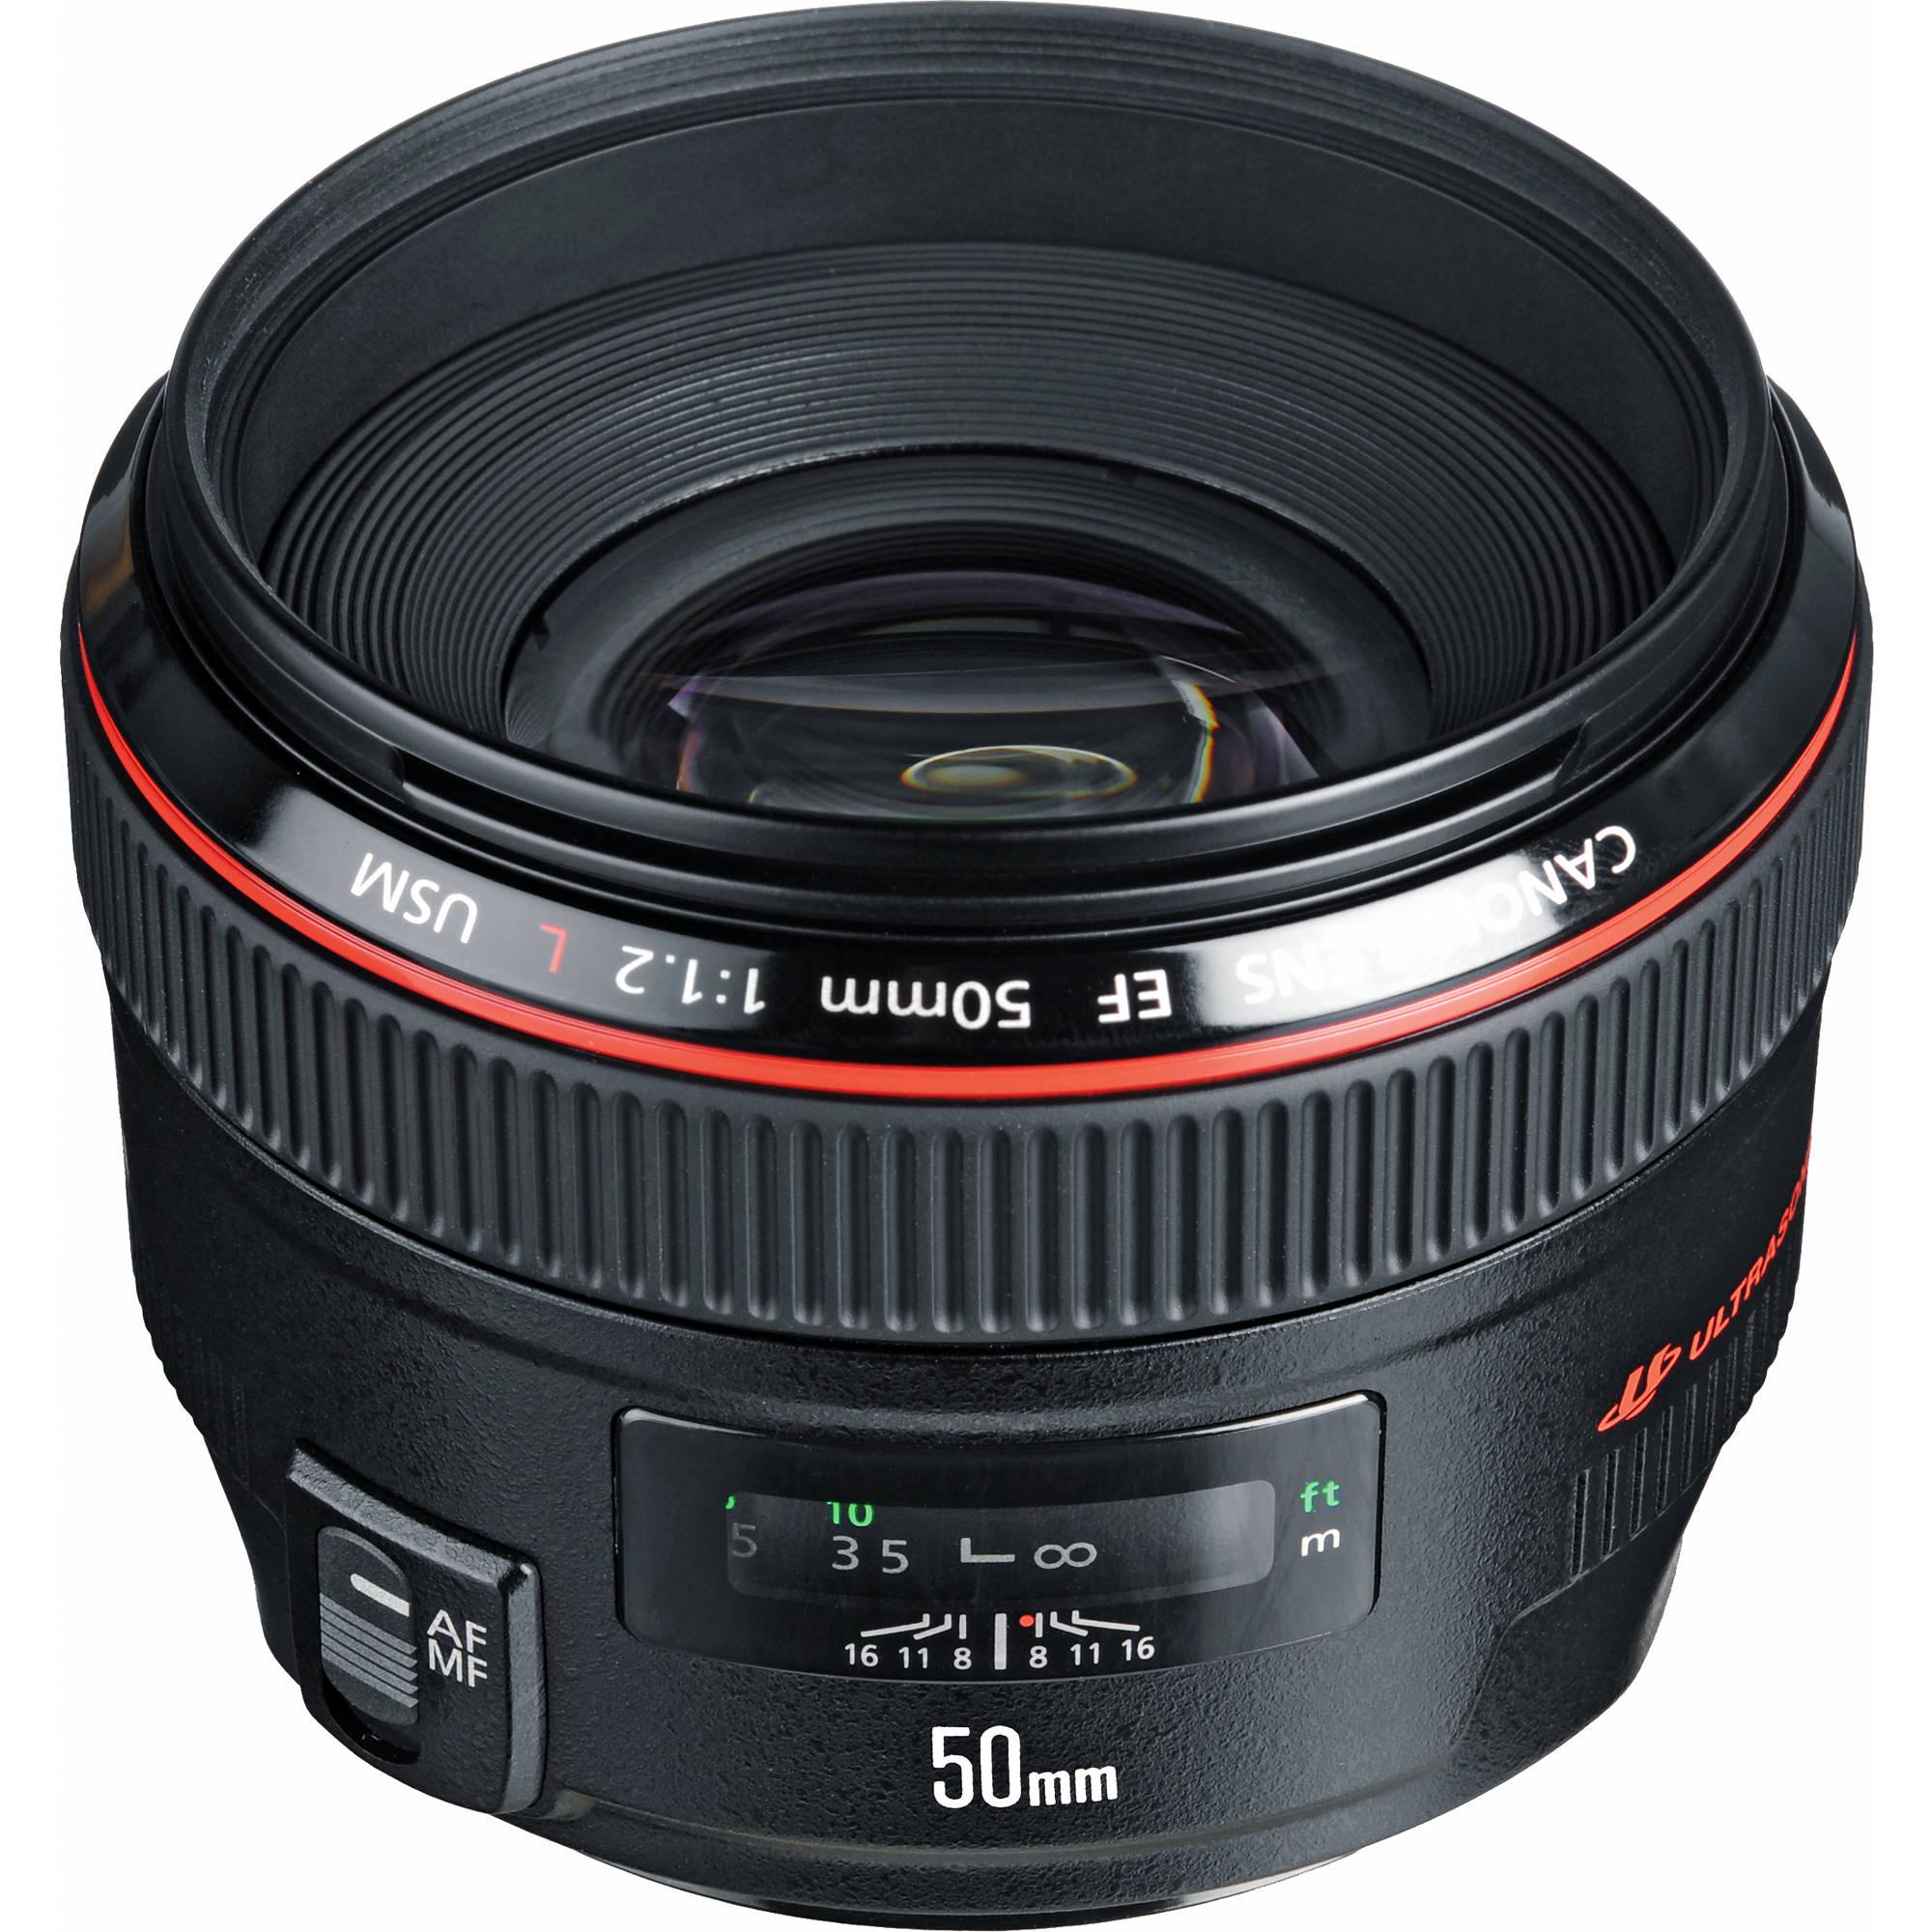 Canon_50mm_12L.jpg